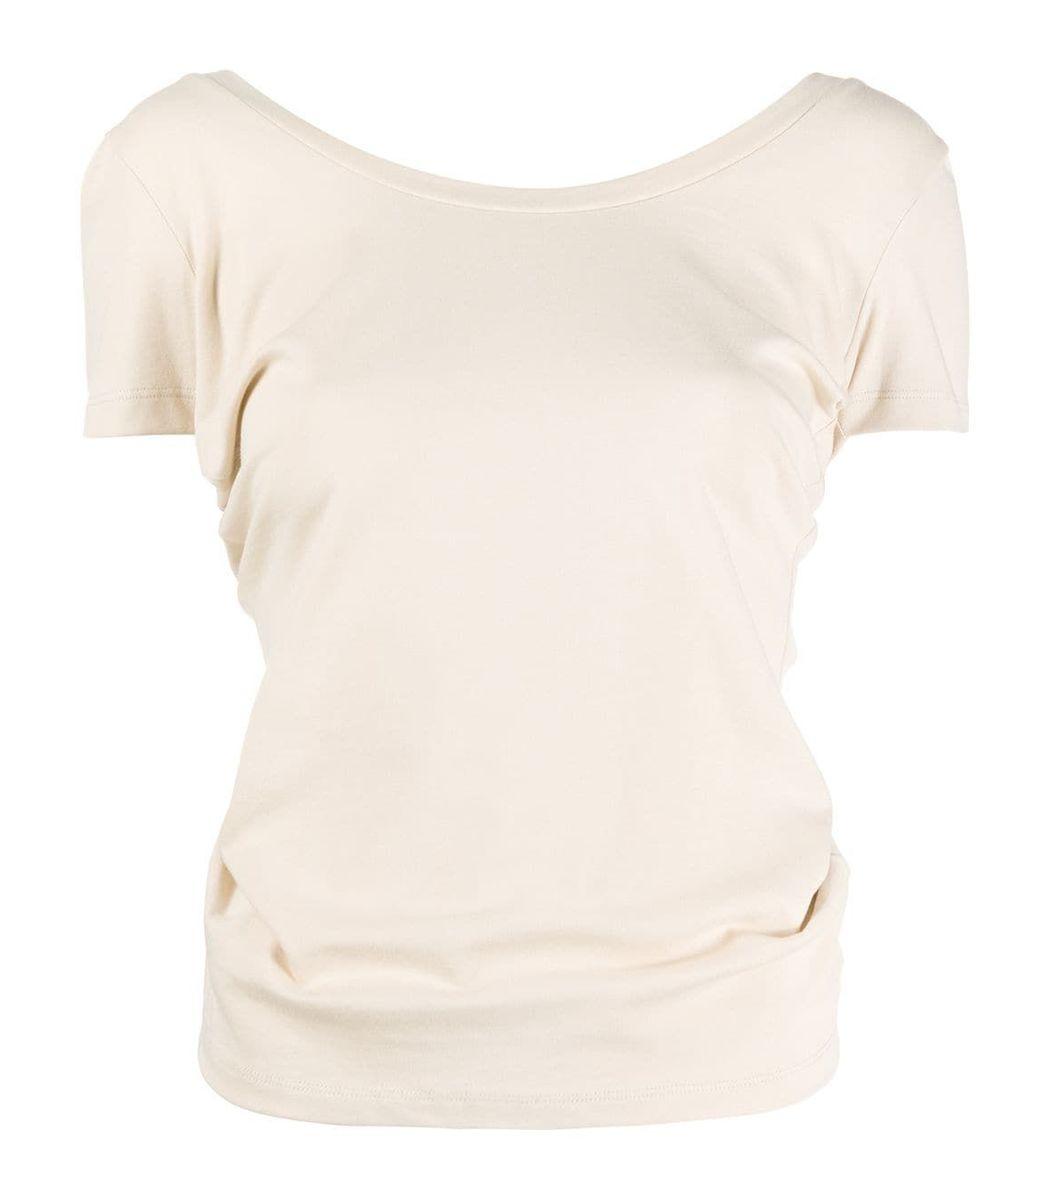 Jacquemus Silks Beige Le T-shirt Sprezza